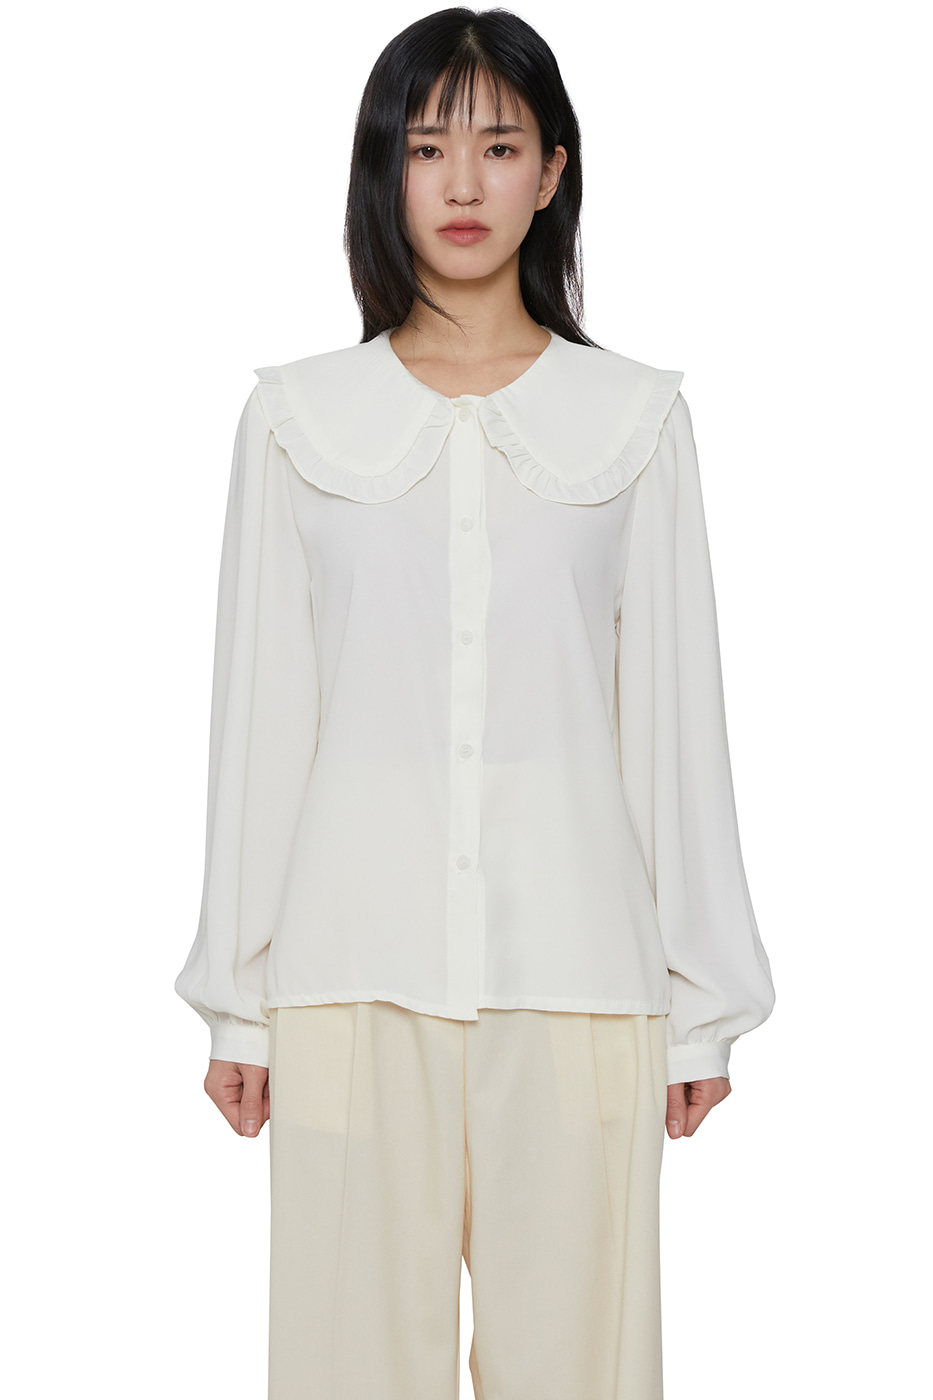 Ruffle point collar blouse